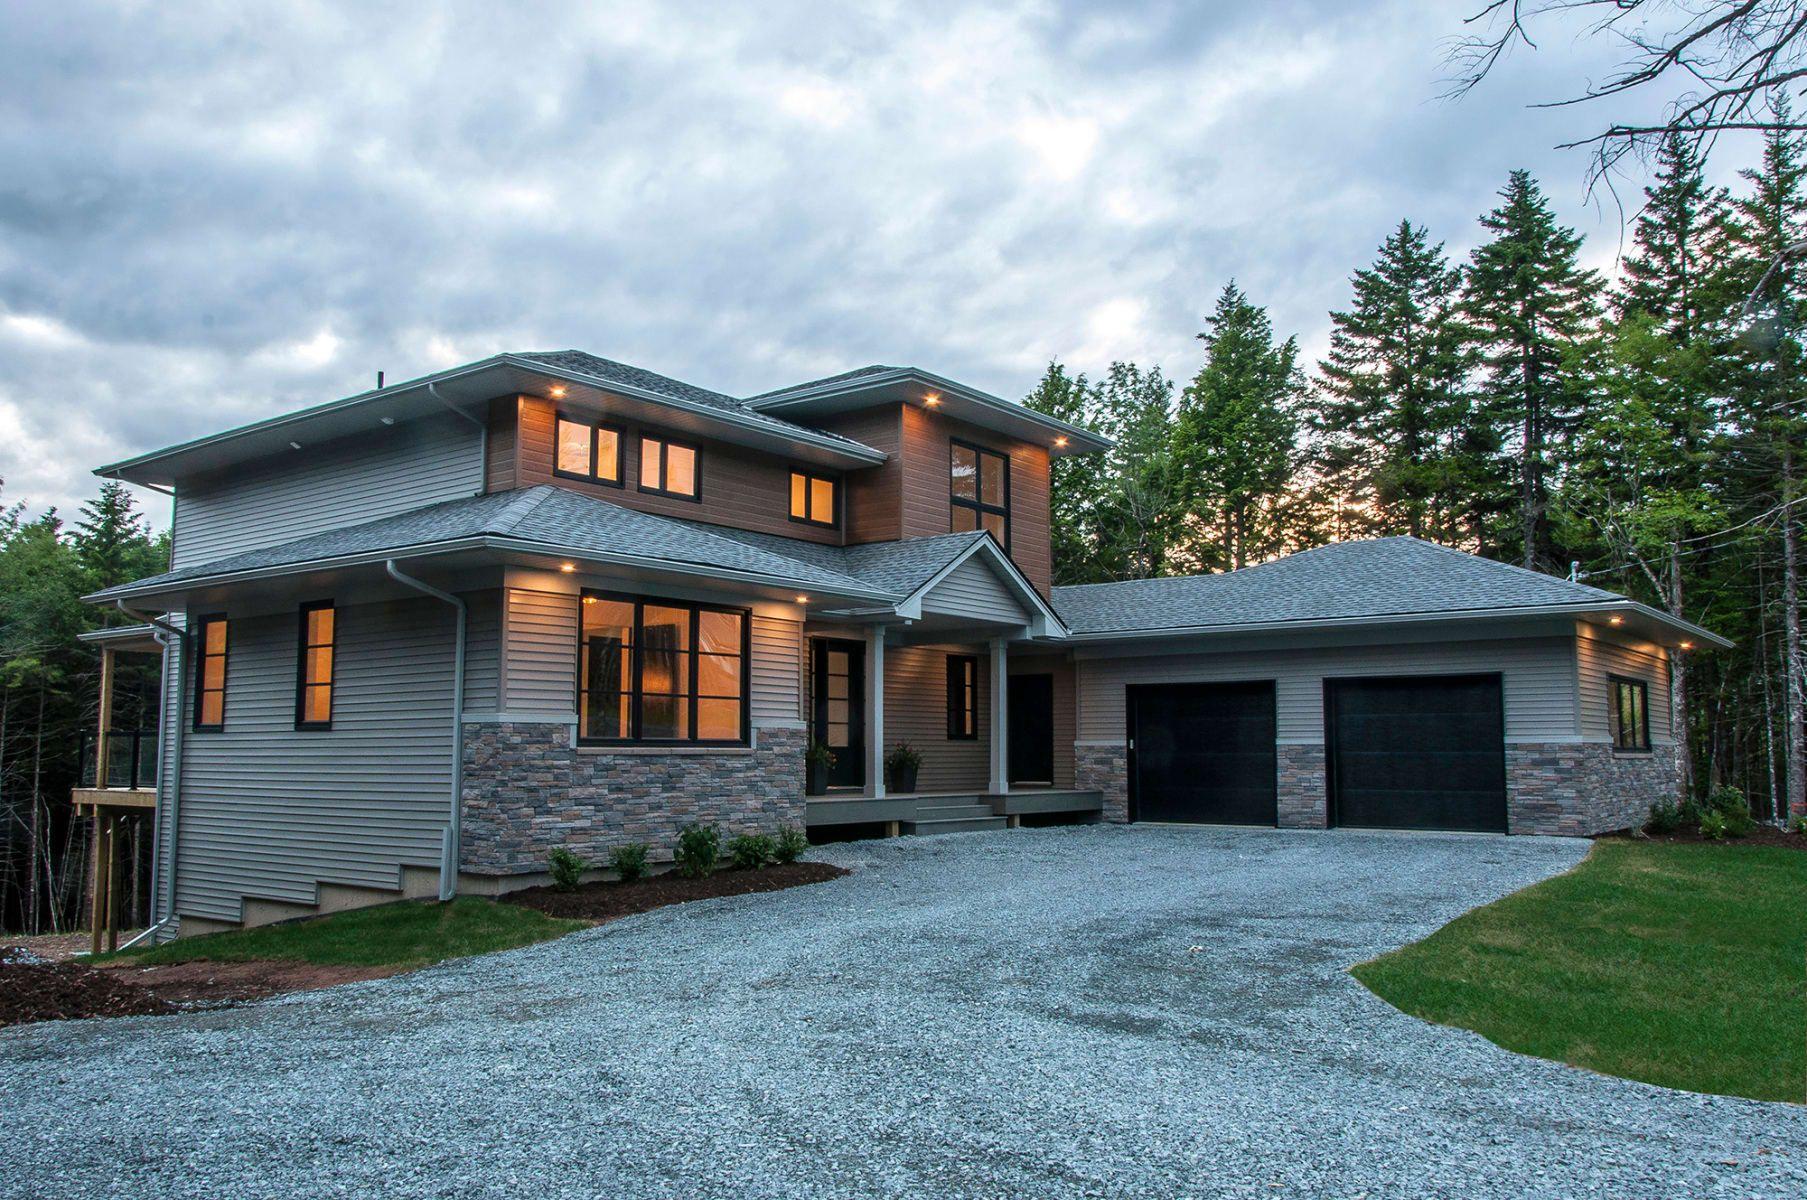 rise modern retreat exterior house ideas house on most popular modern dream house exterior design ideas the best destination id=20528